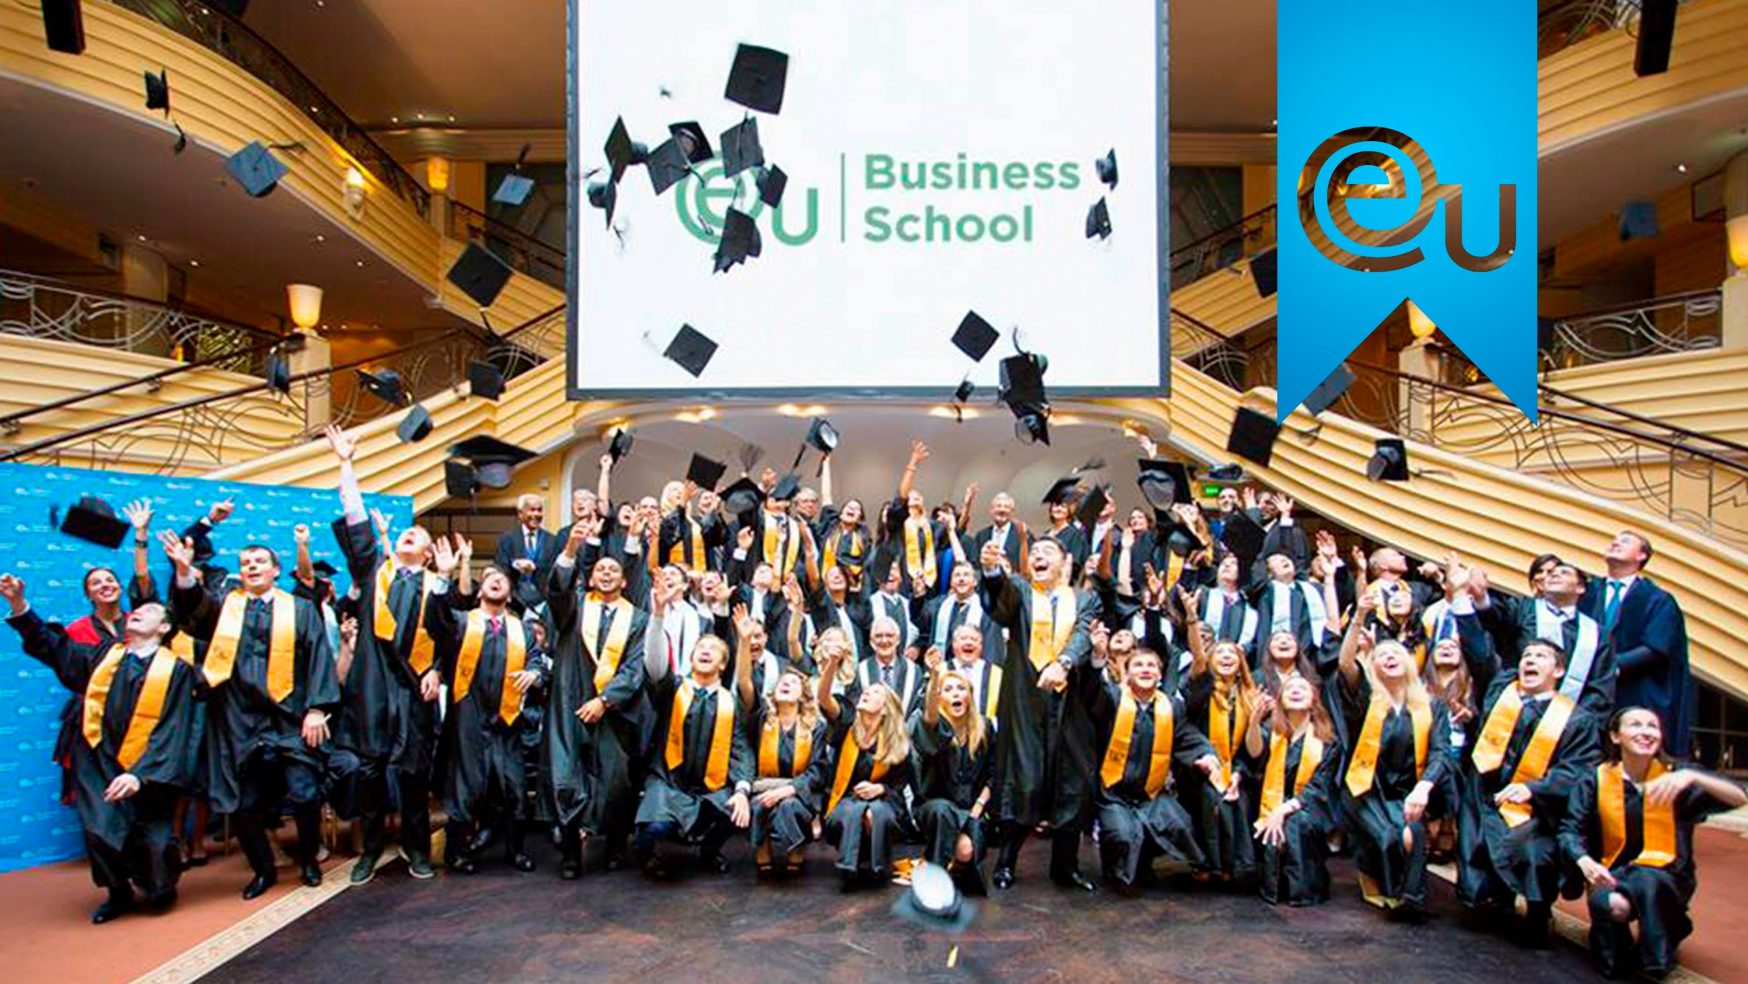 EU Business School Commencement Videos